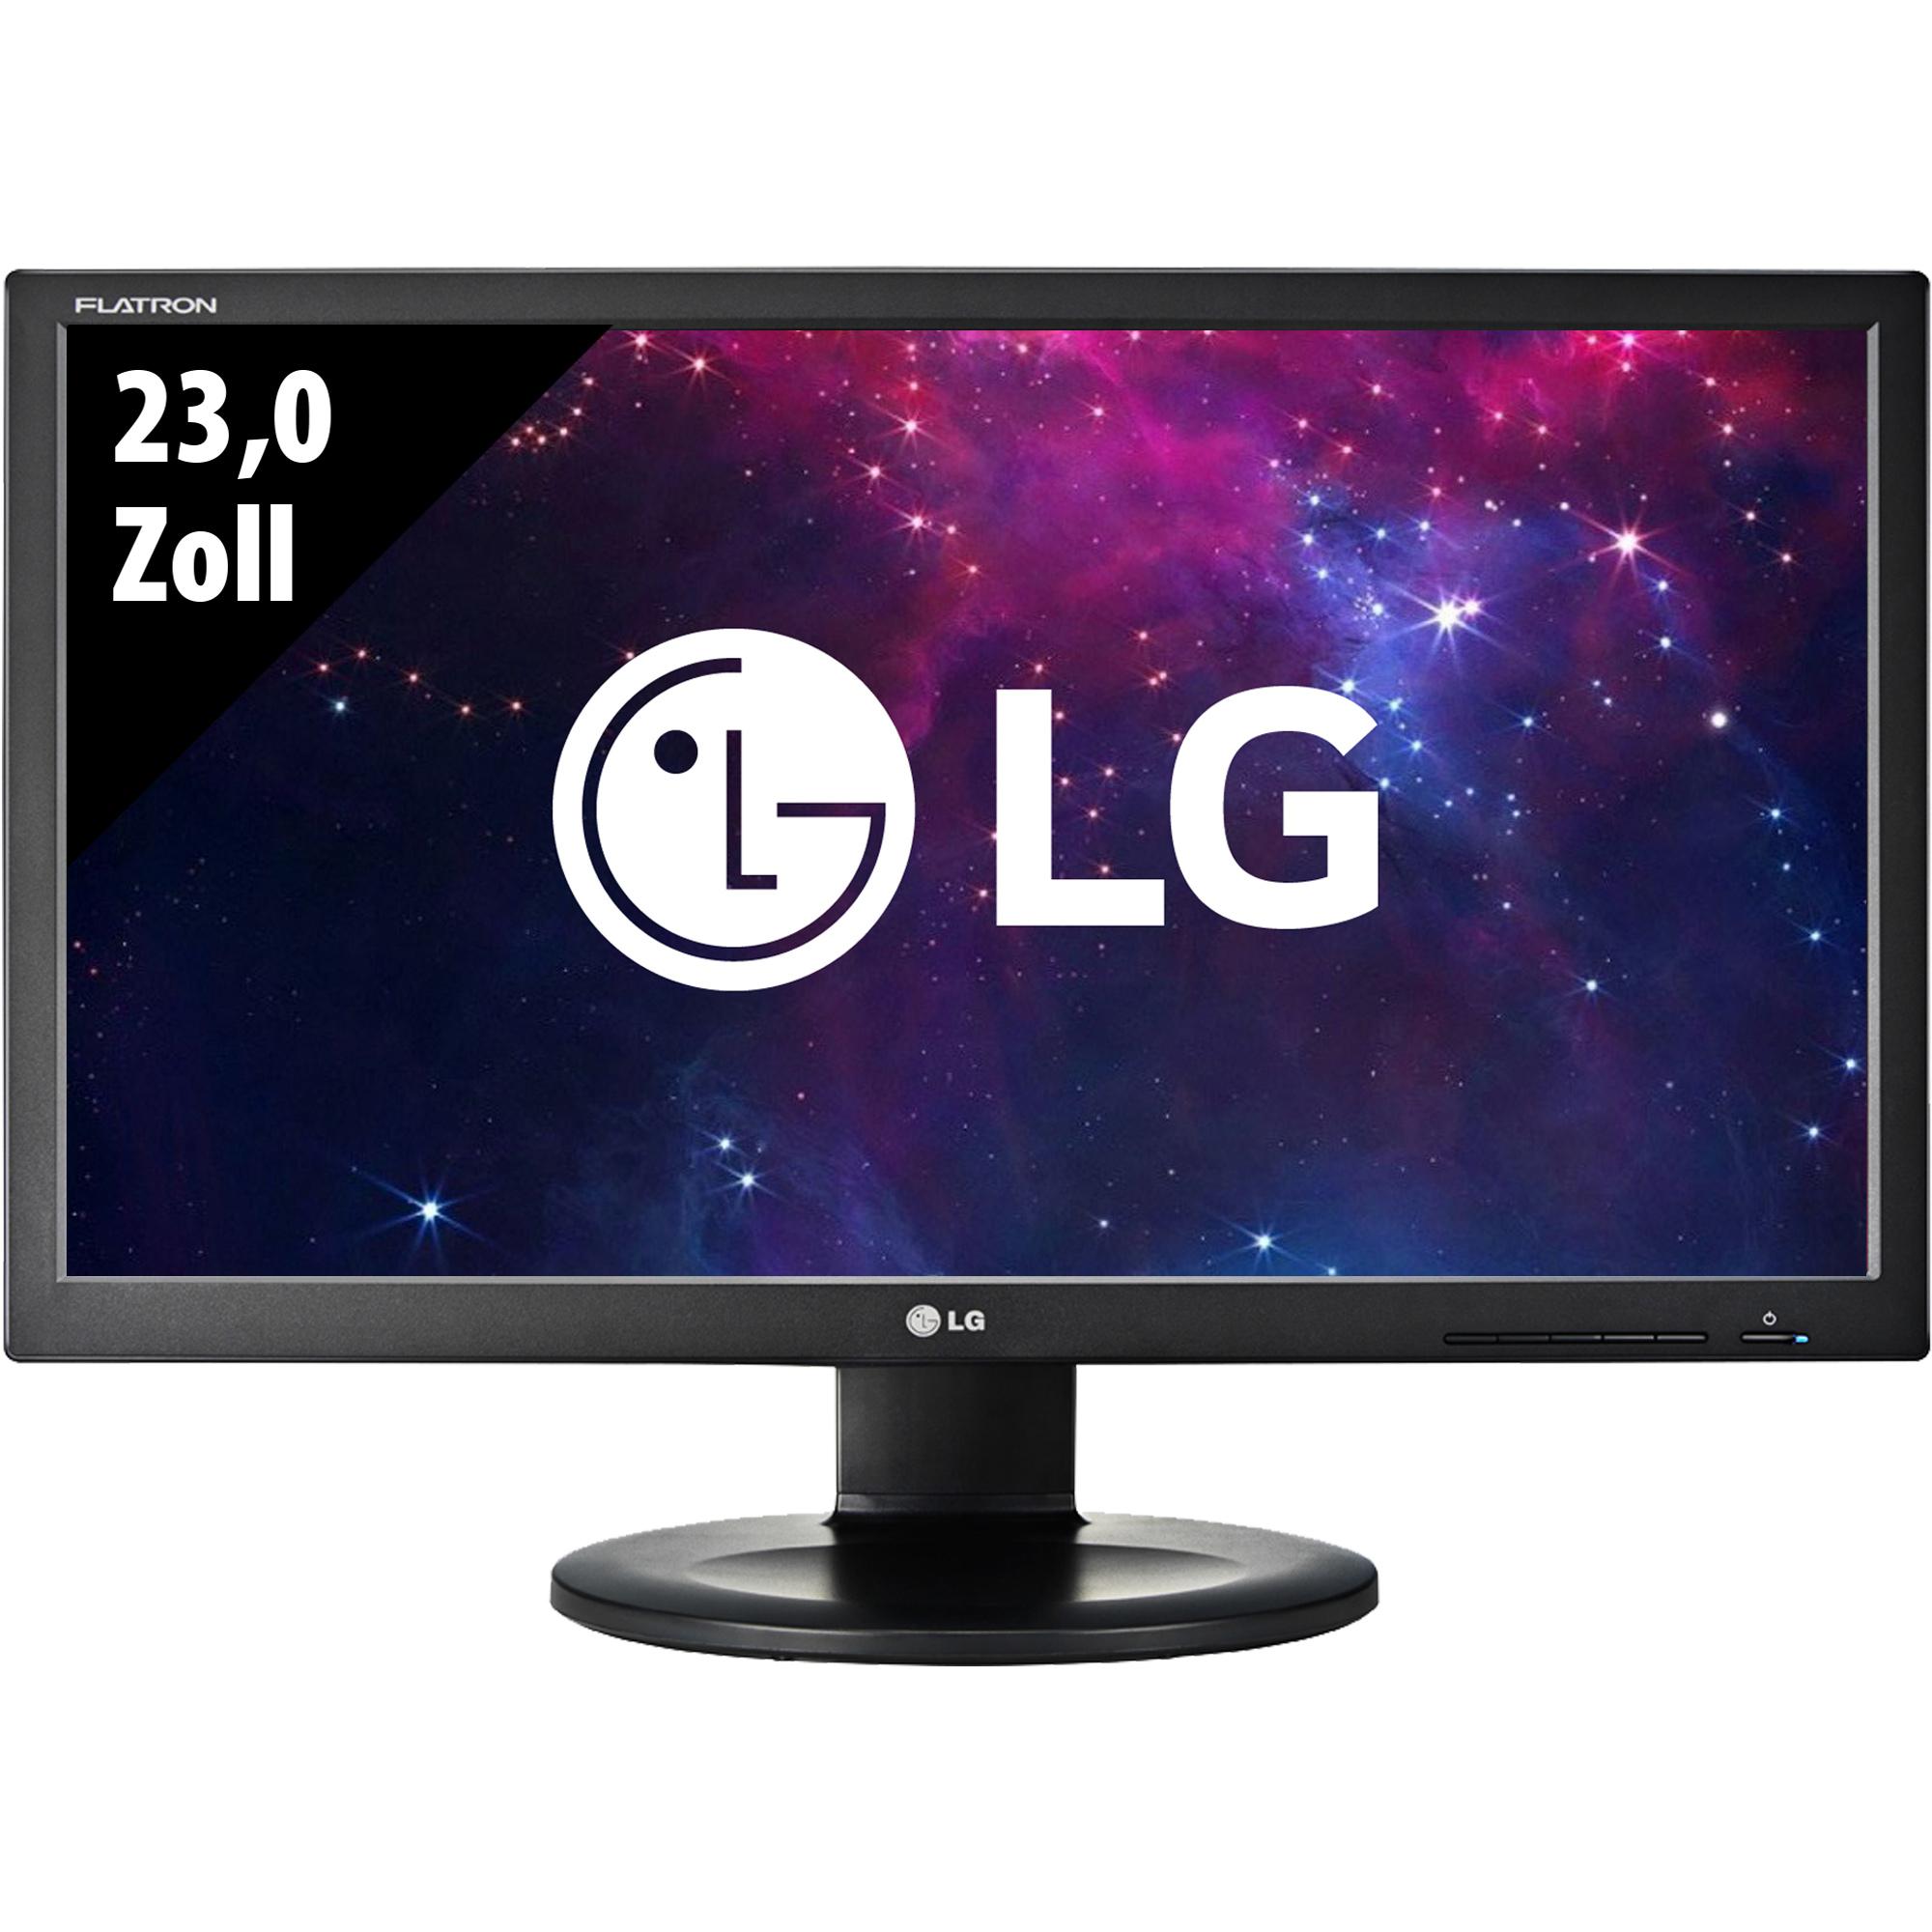 "Écran PC 23"" Lg Flatron IPS231P-BN - full HD, LED IPS, 60hz, 5ms (Reconditionné - Grade B)"